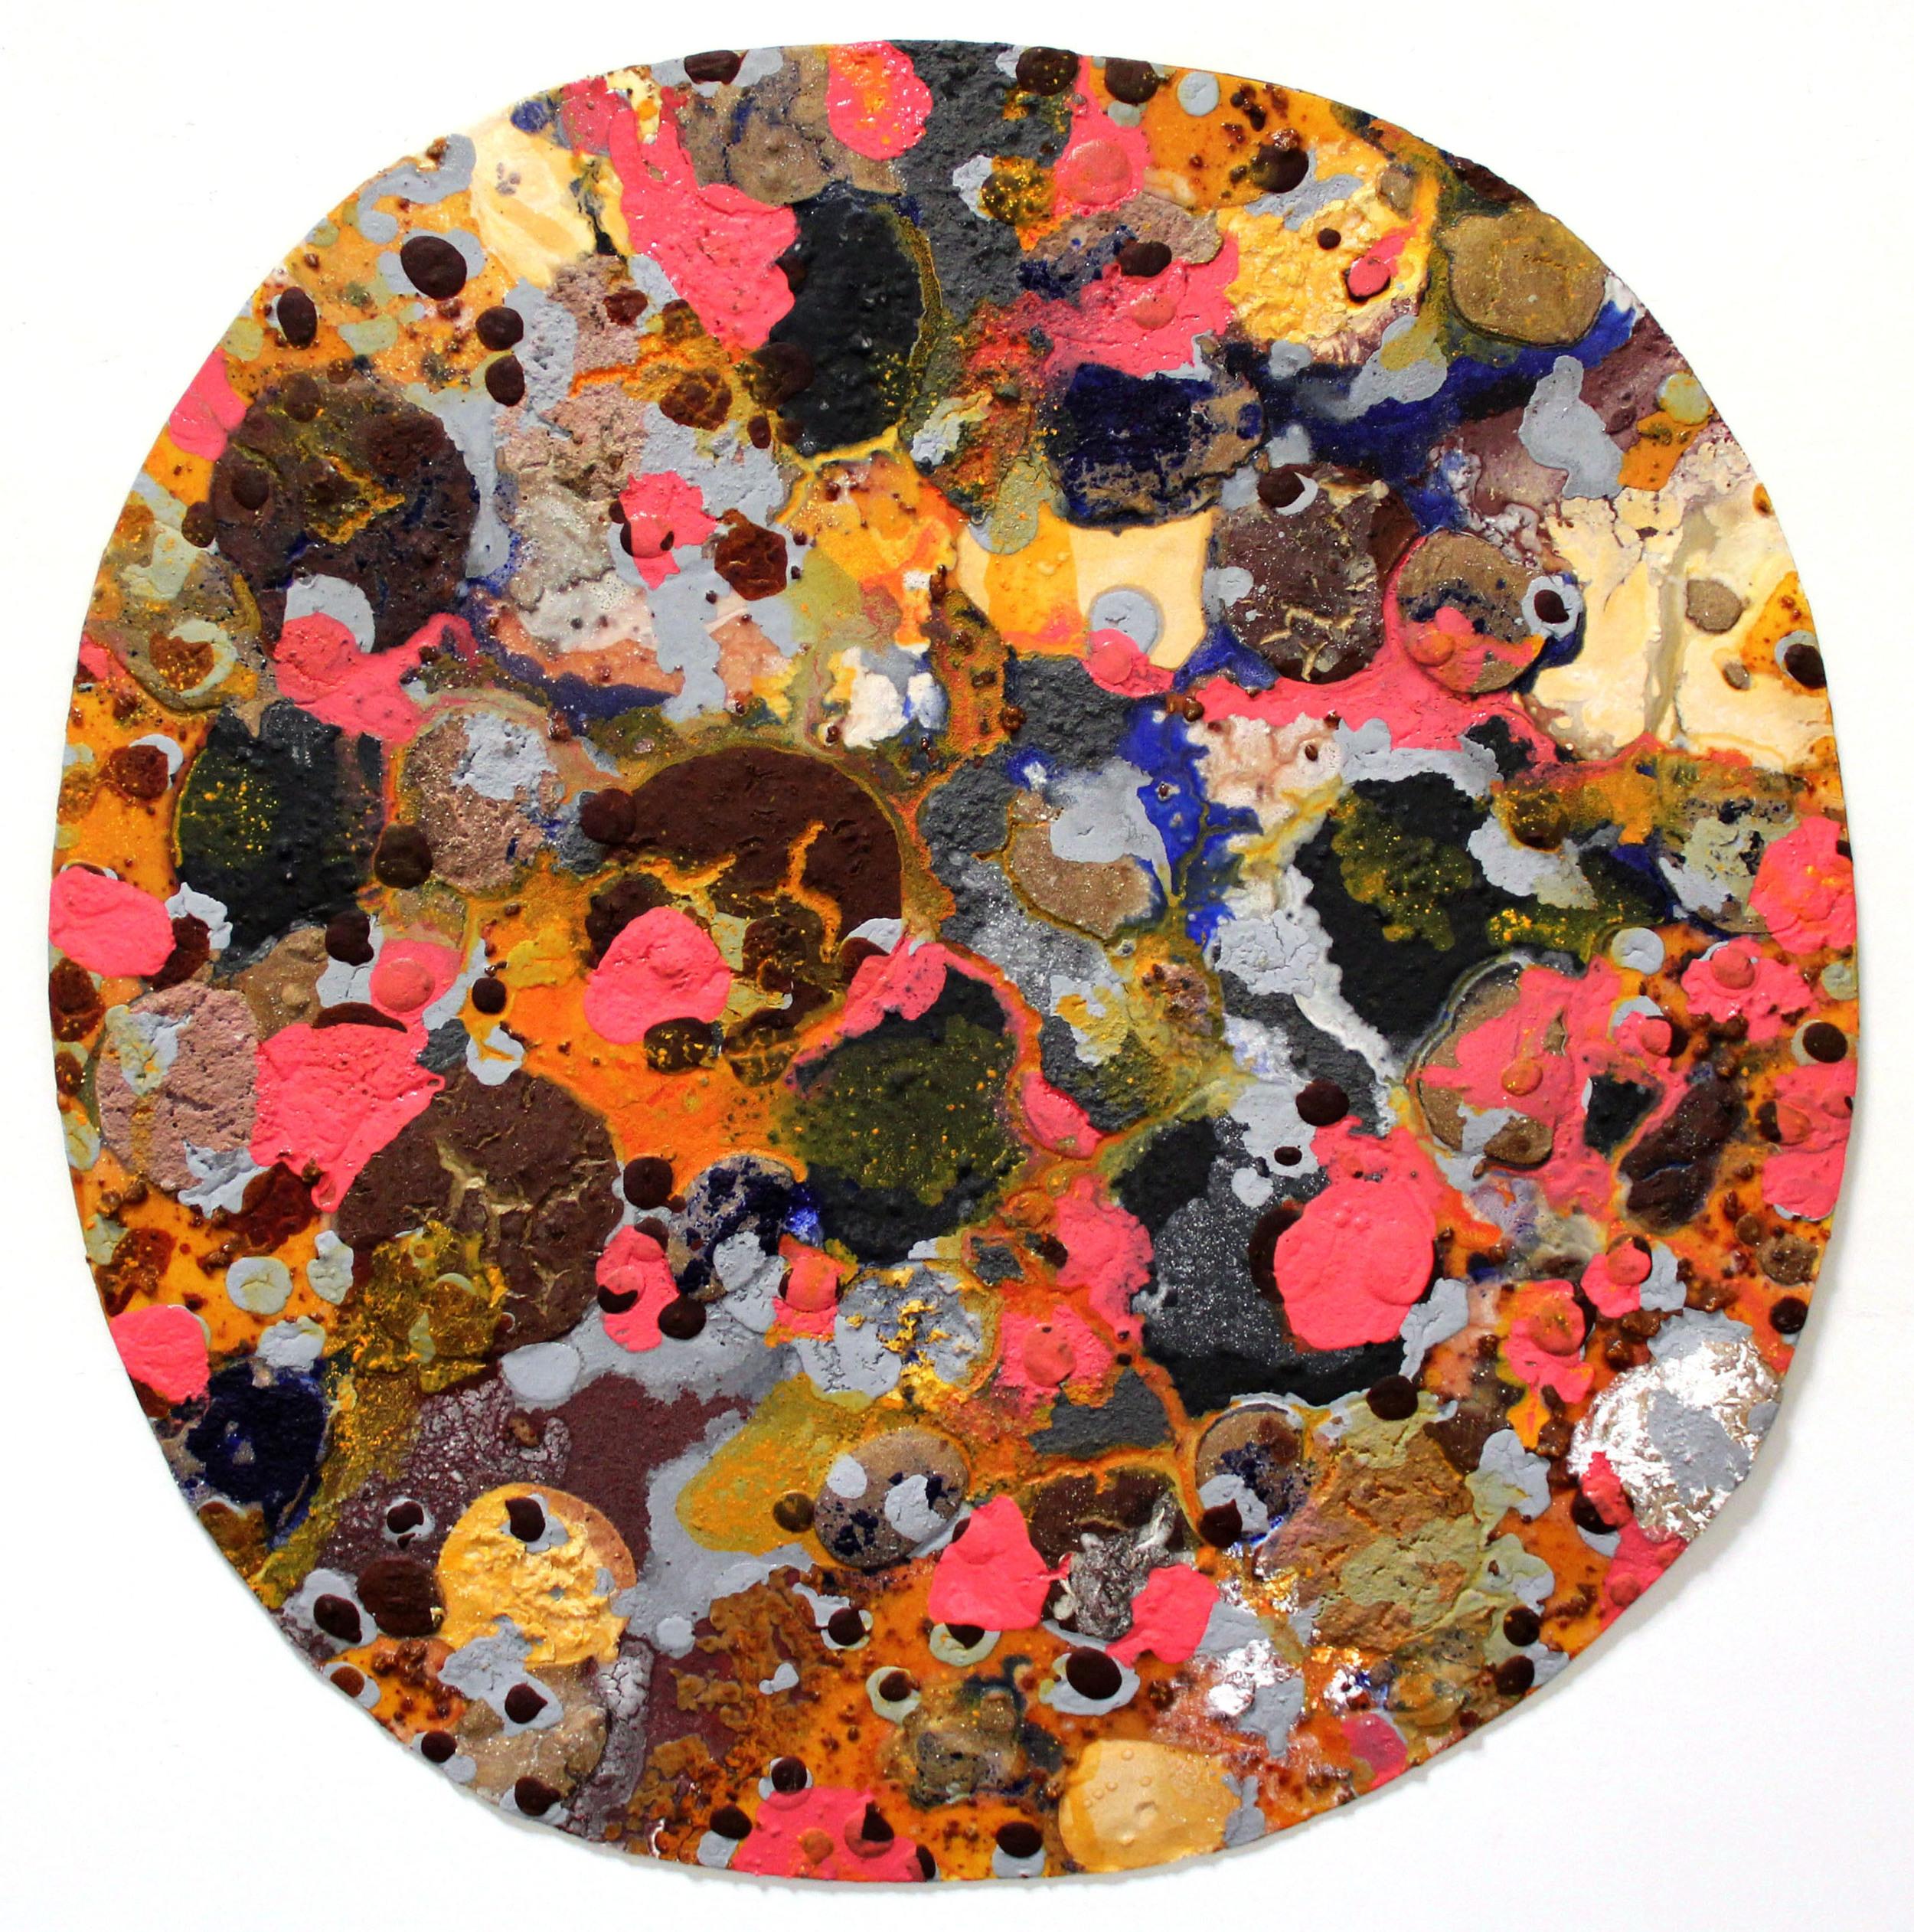 molecularly  acrylic, mixed media on masonite  48 inches diameter